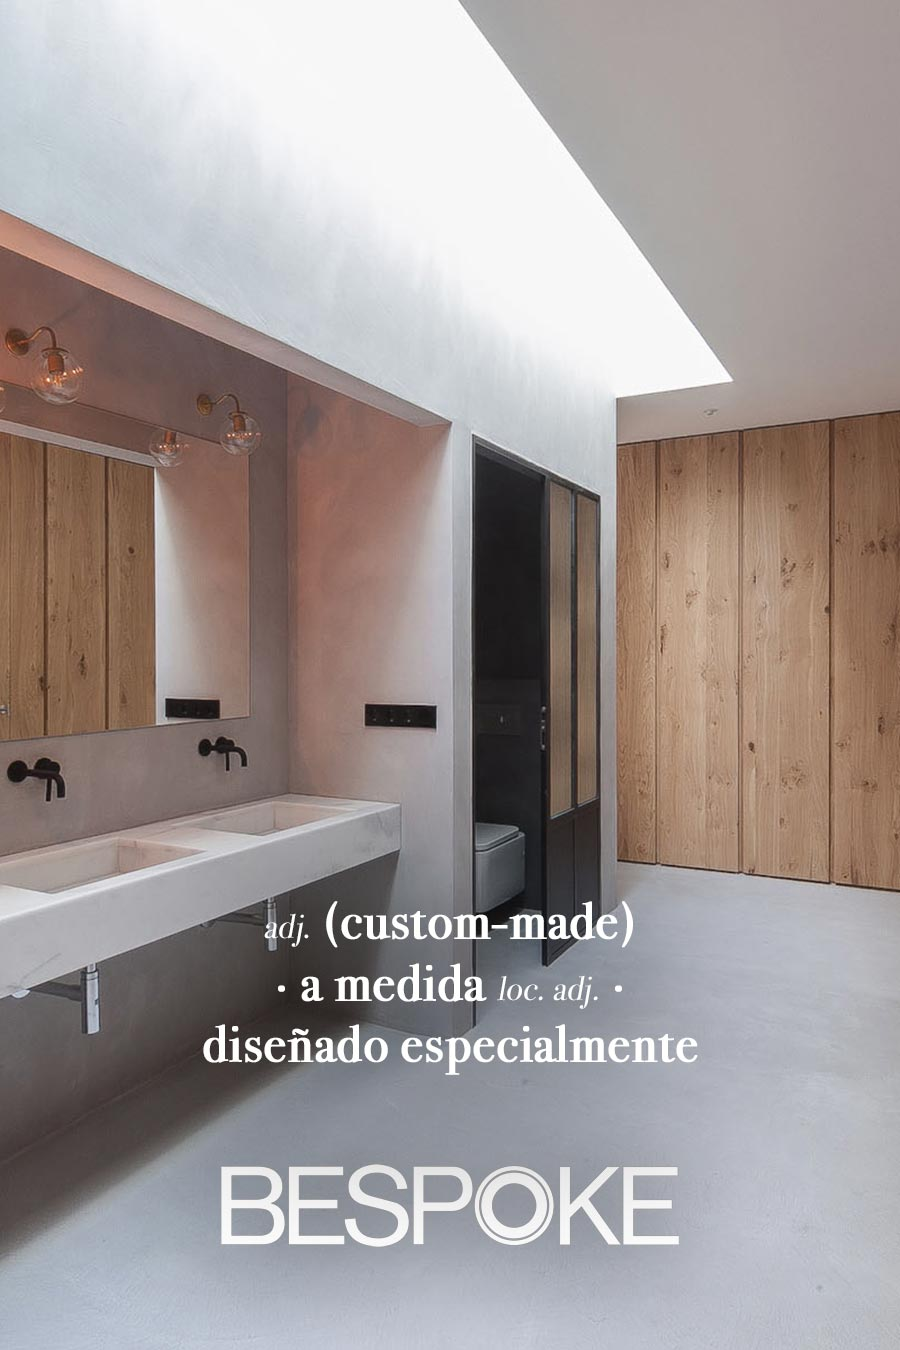 HOME_BESPOKE_CASA PATIO_04_2:3